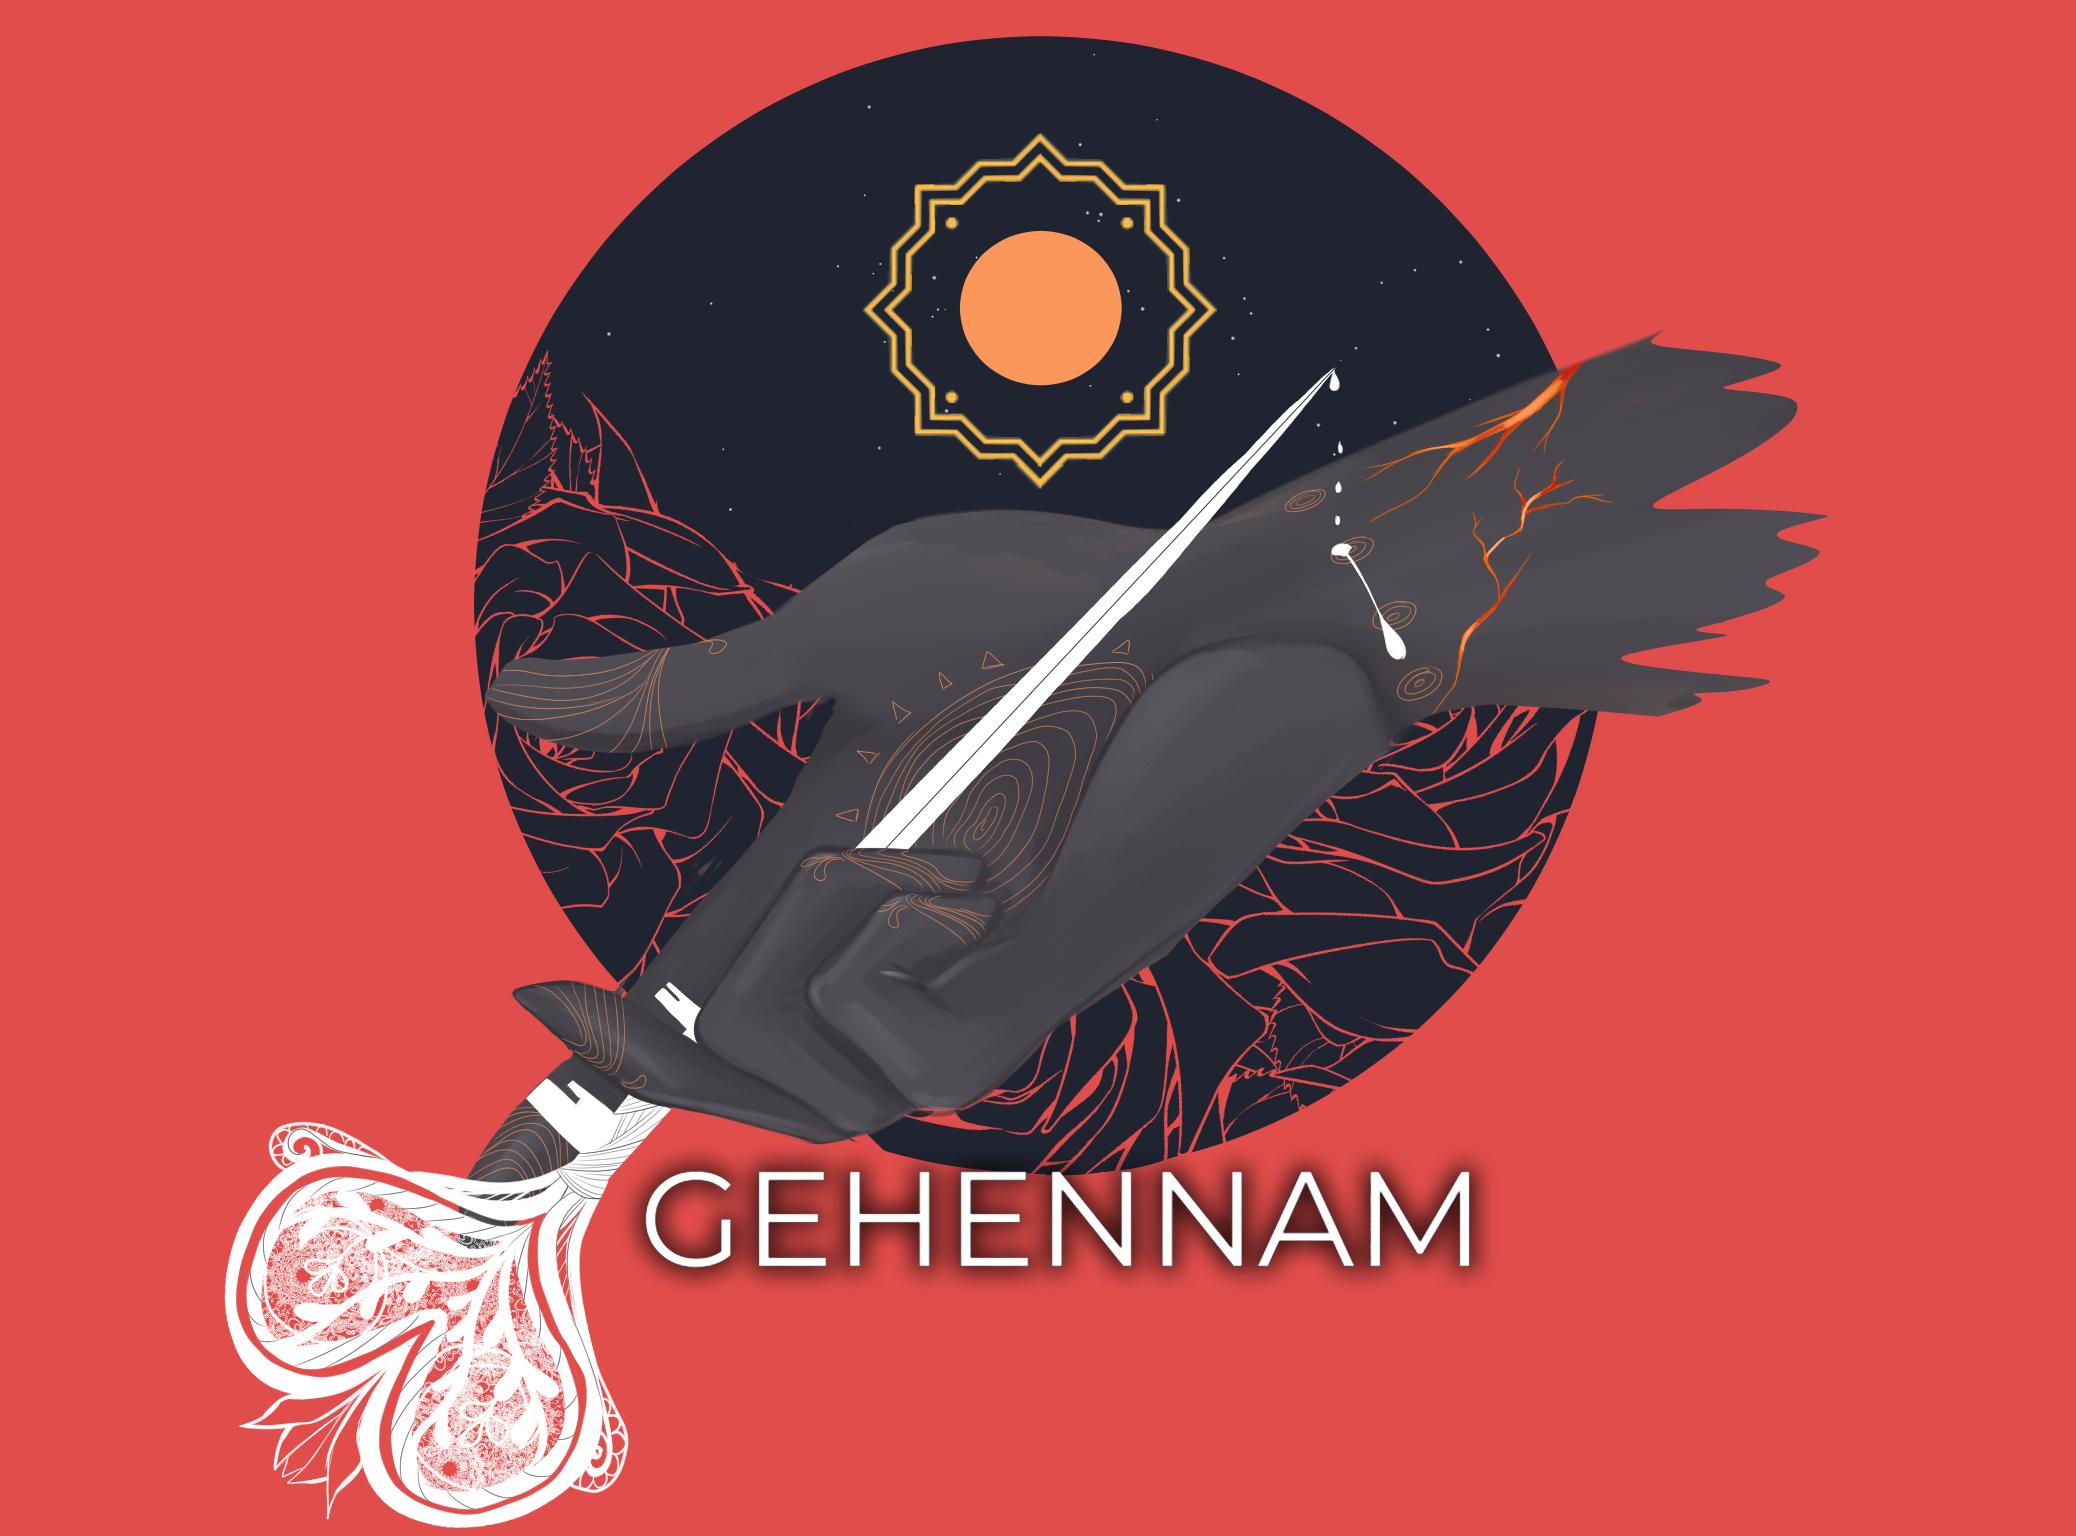 Gehennam